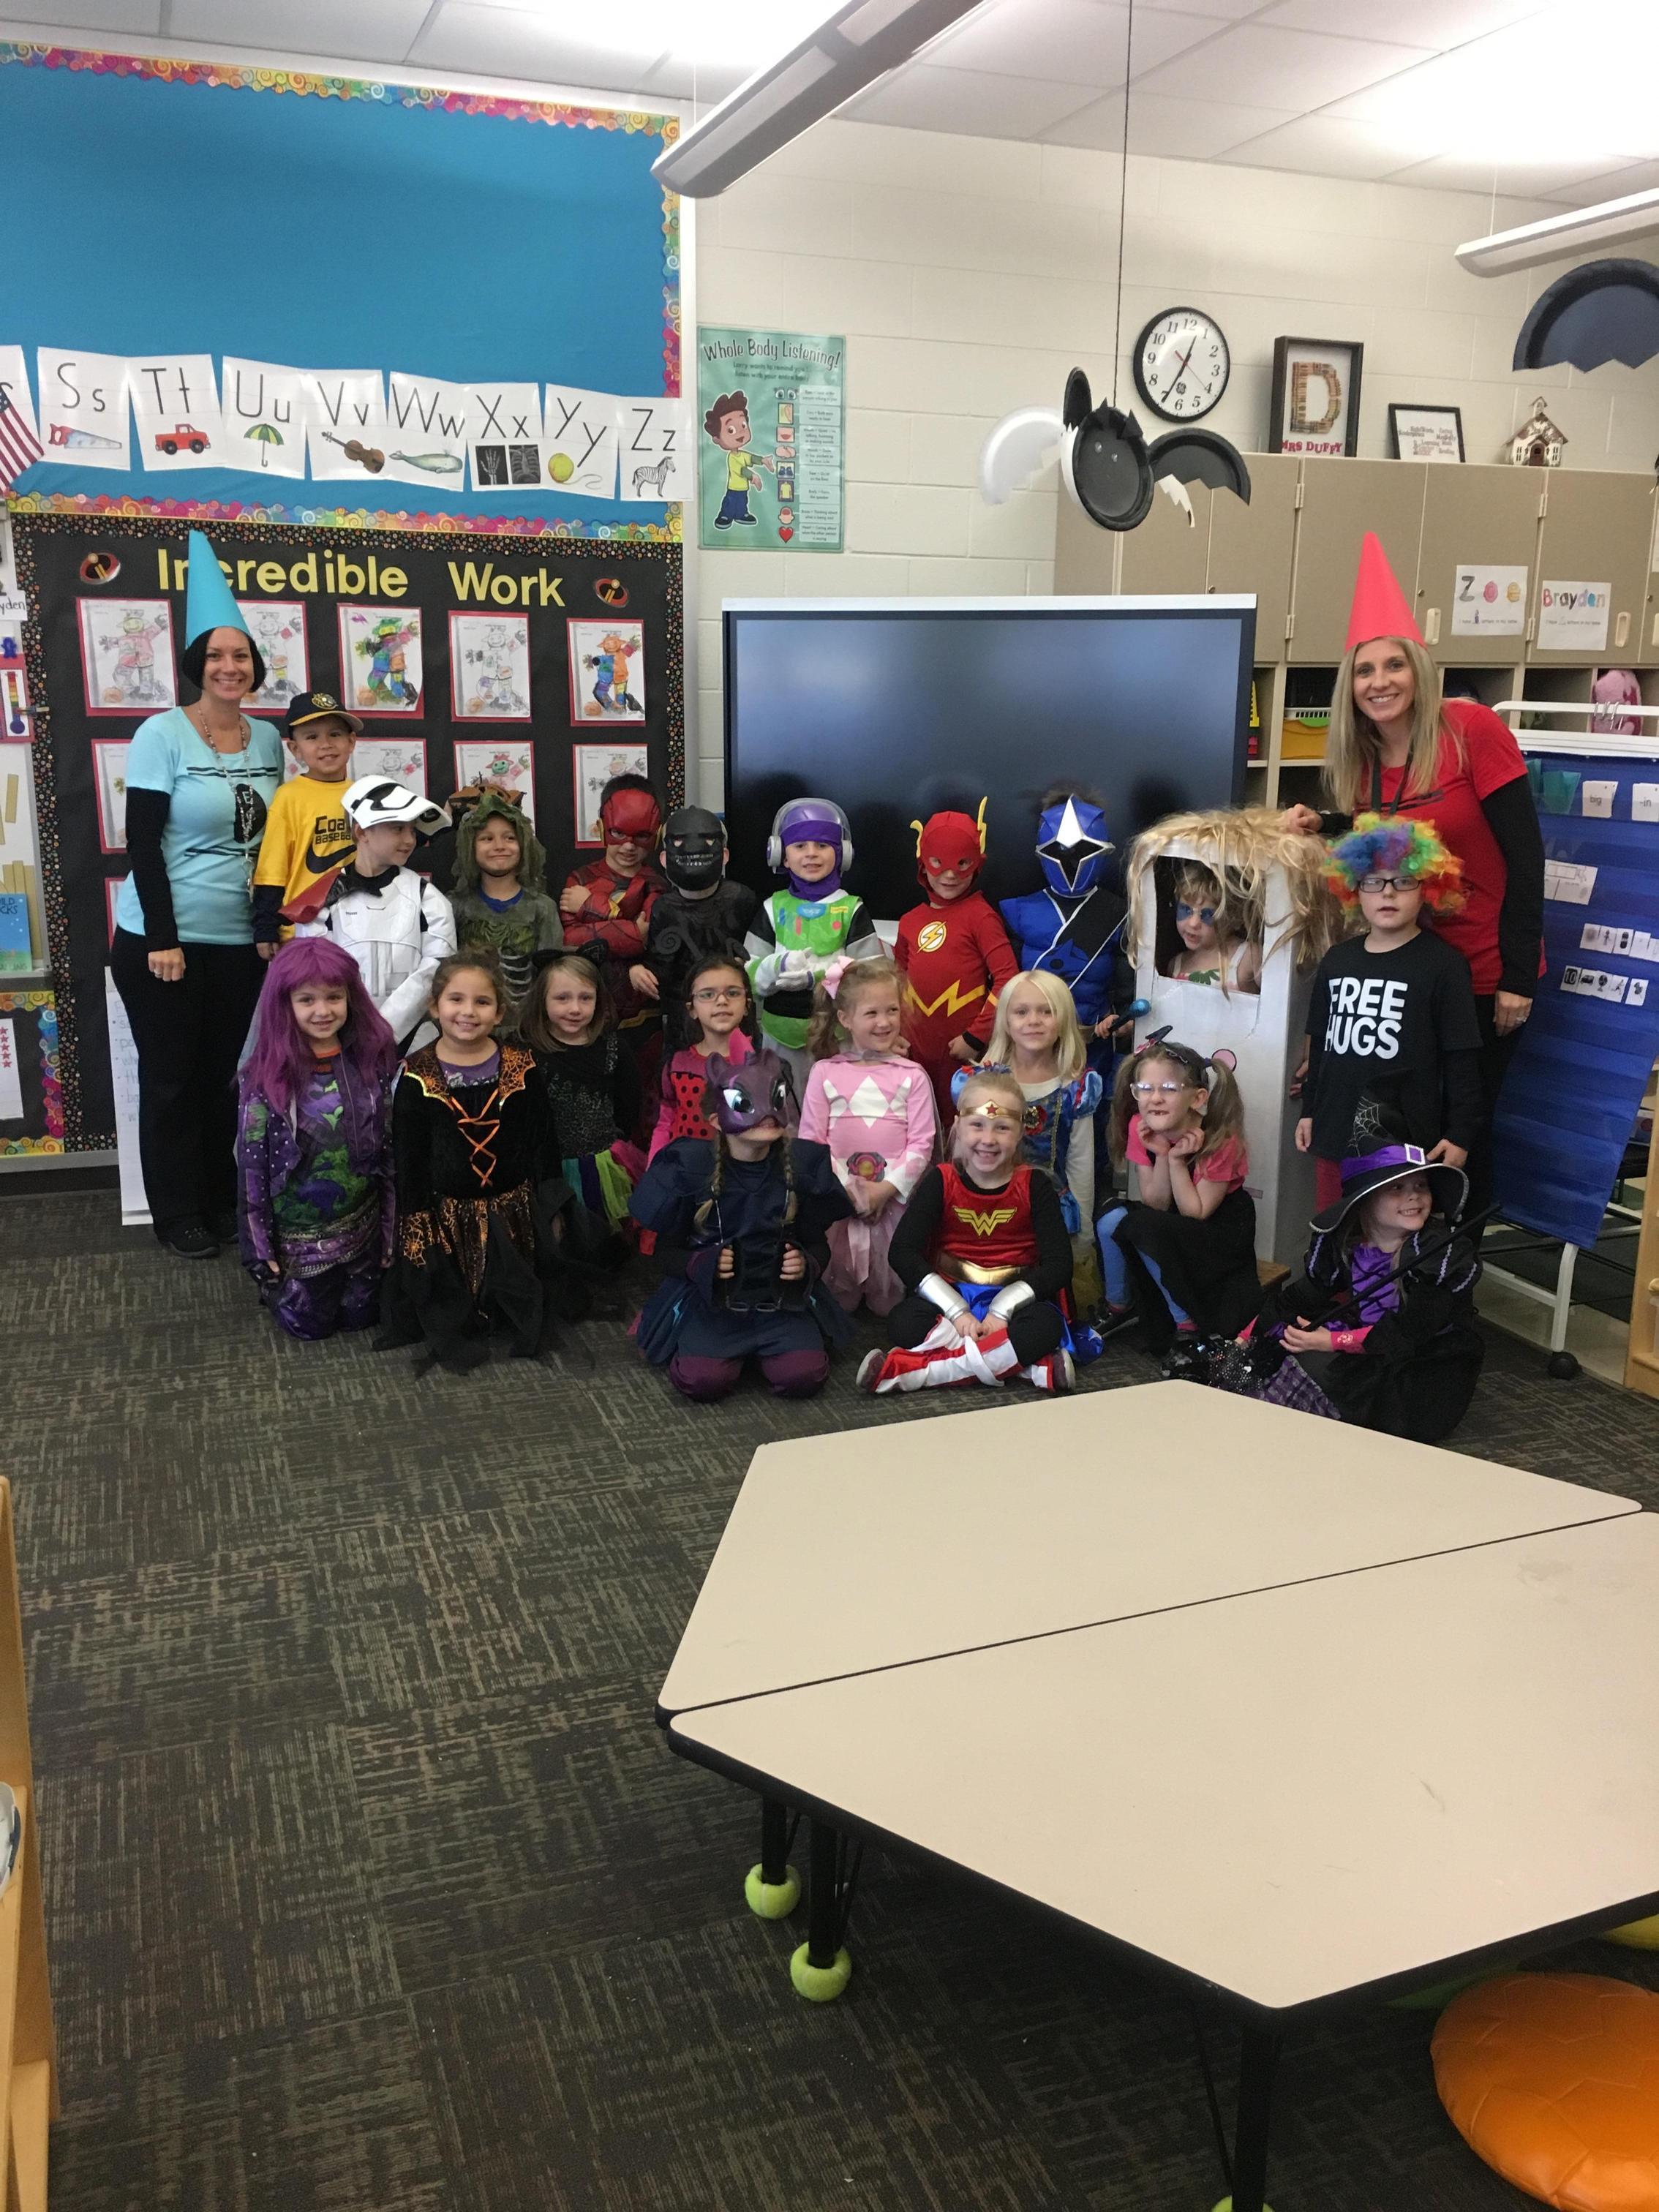 Classroom Halloween picture